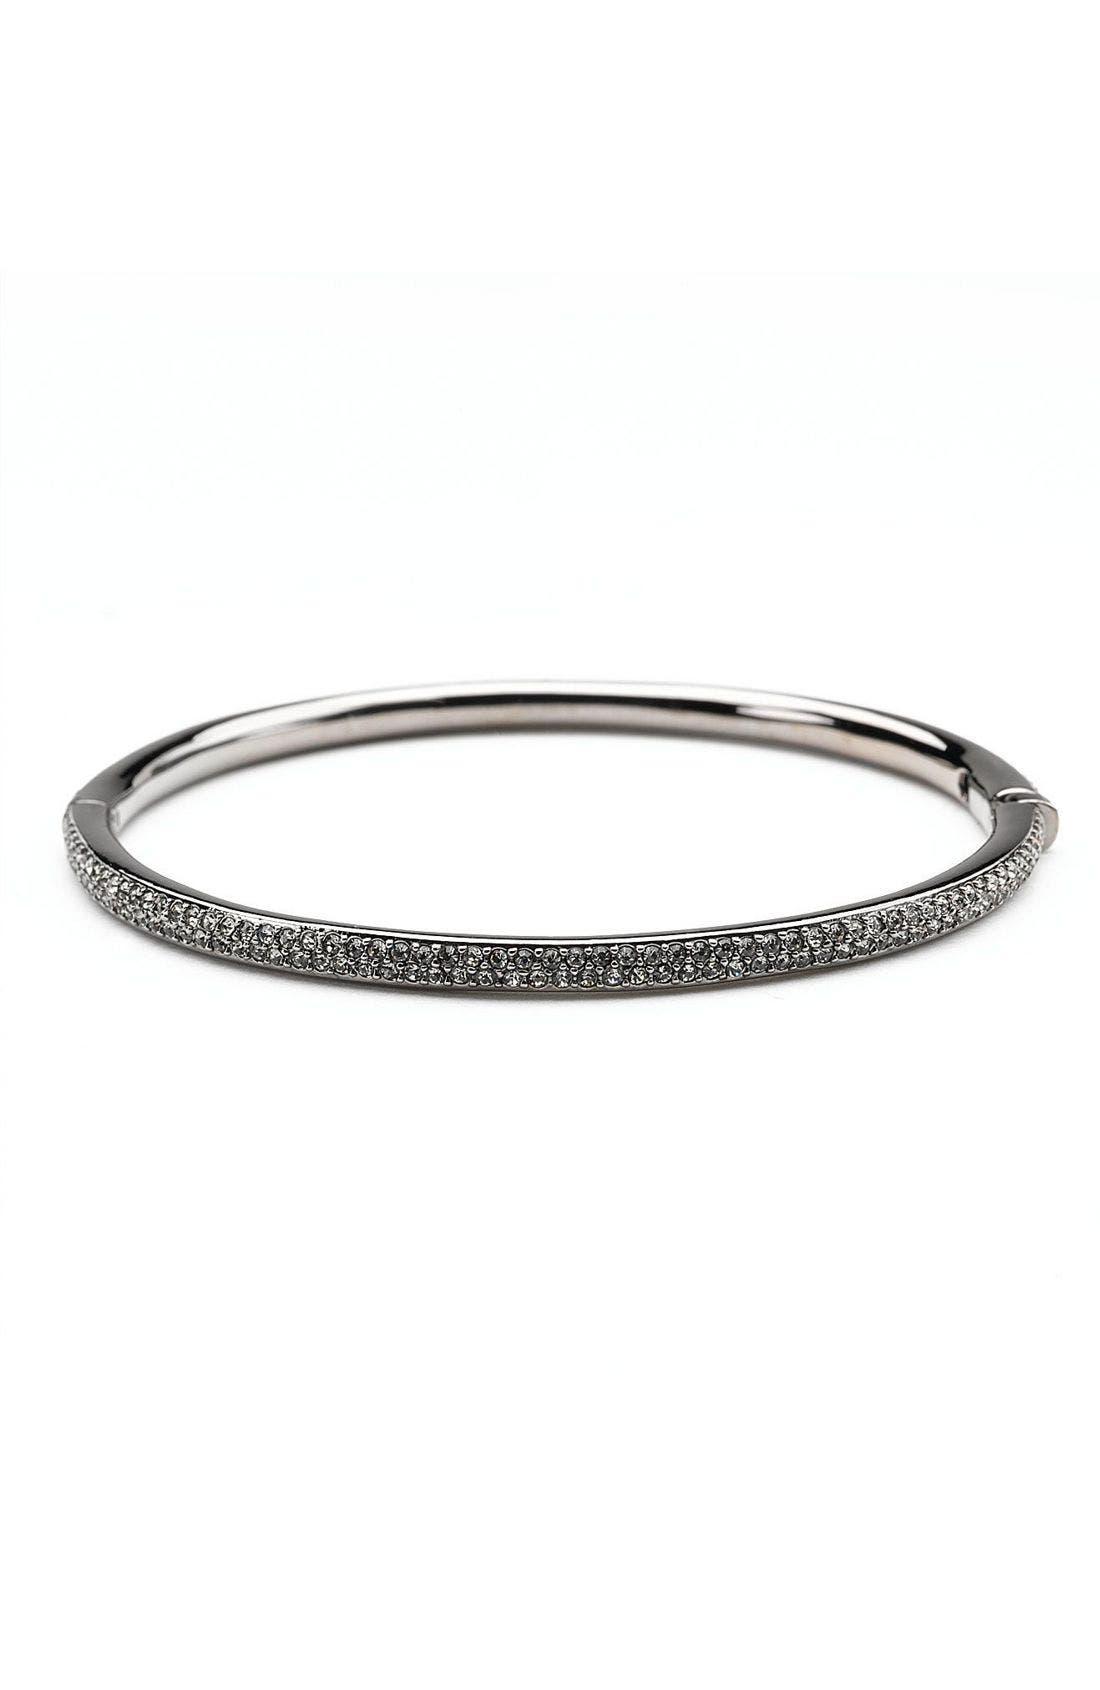 Alternate Image 1 Selected - Nadri Pavé Bangle Bracelet